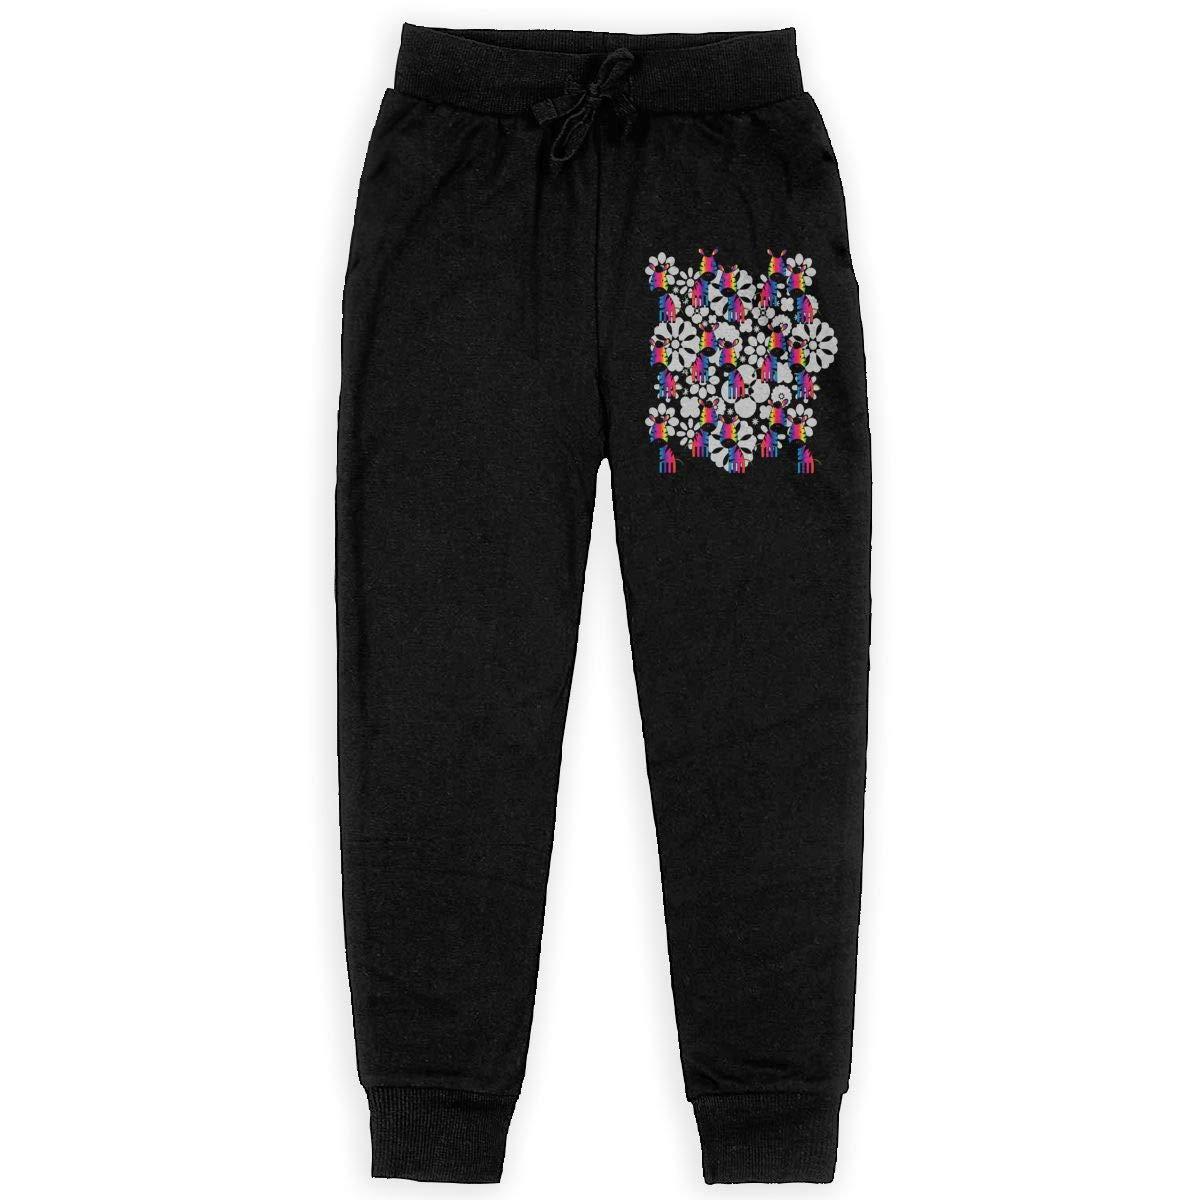 IufnNRJndfu Dazzle Color Zebra Boys Athletic Smart Fleece Pant Youth Soft and Cozy Sweatpants